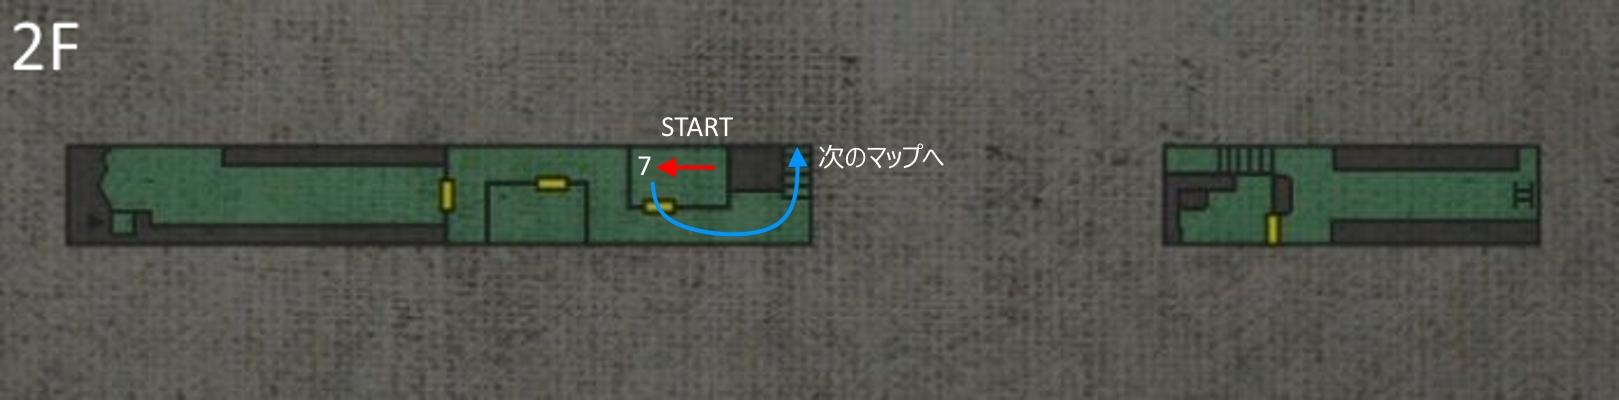 map_train09